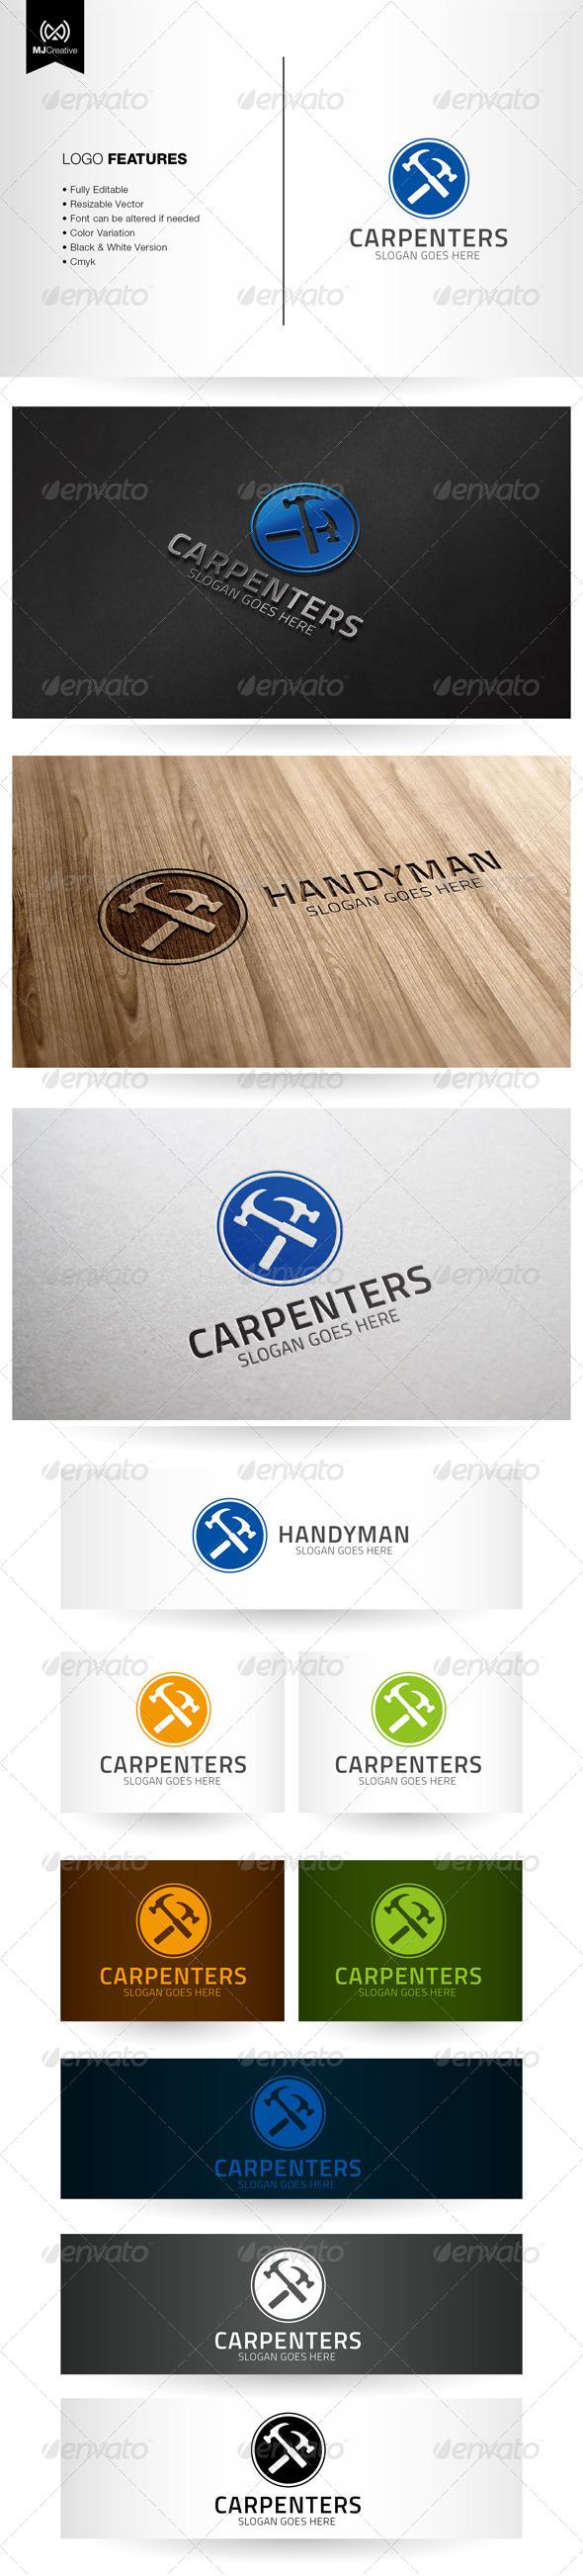 Handyman and Carpentry Logo